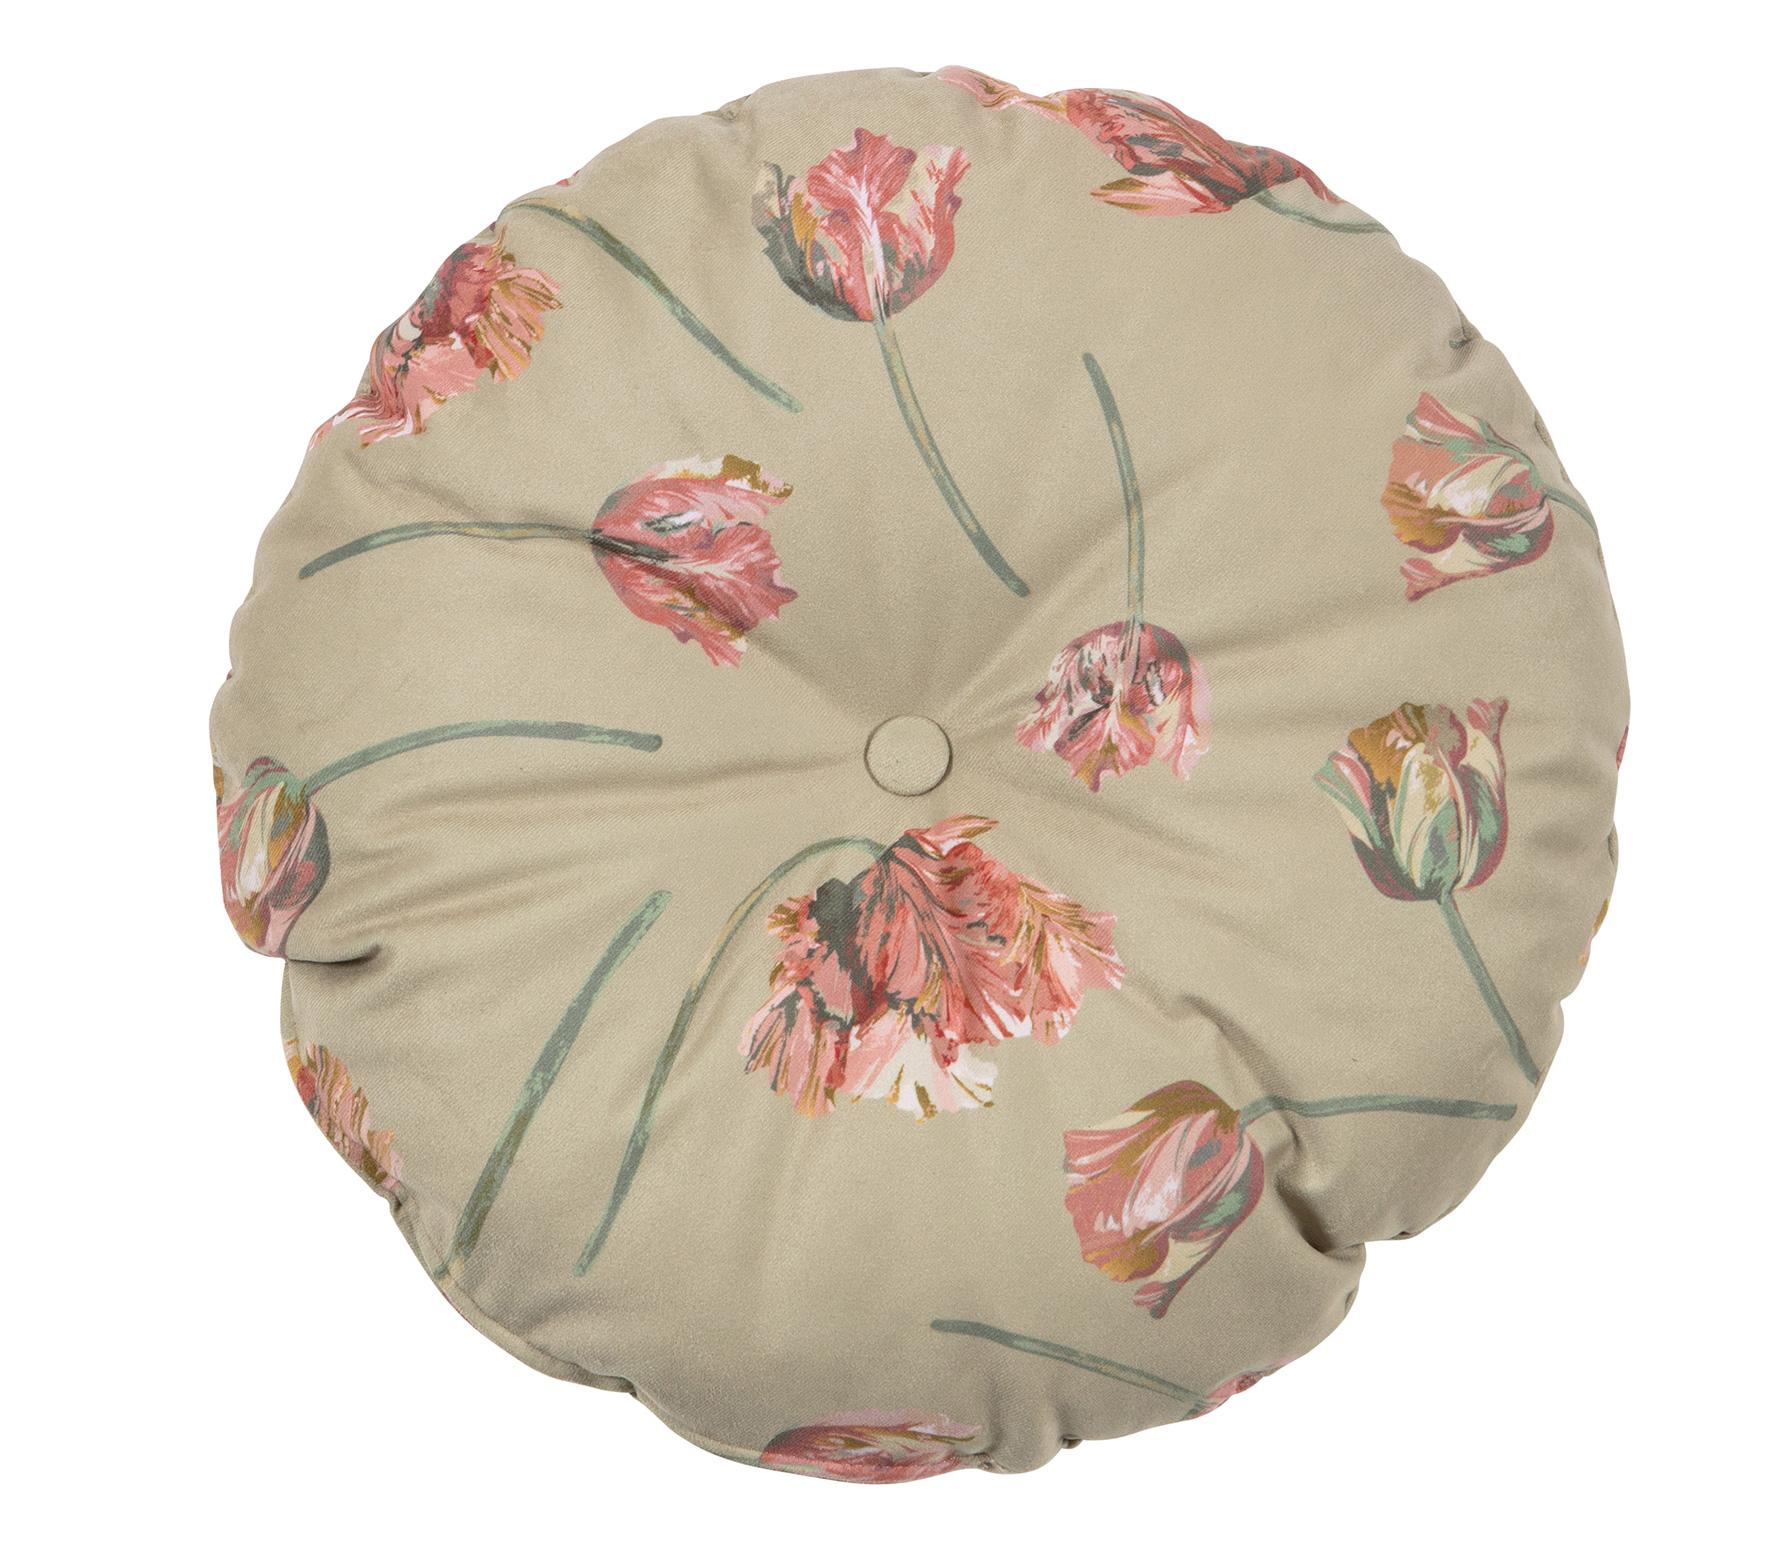 BePureHome Vogue Rococo kussen ø45 cm velvet agave zachtgroen